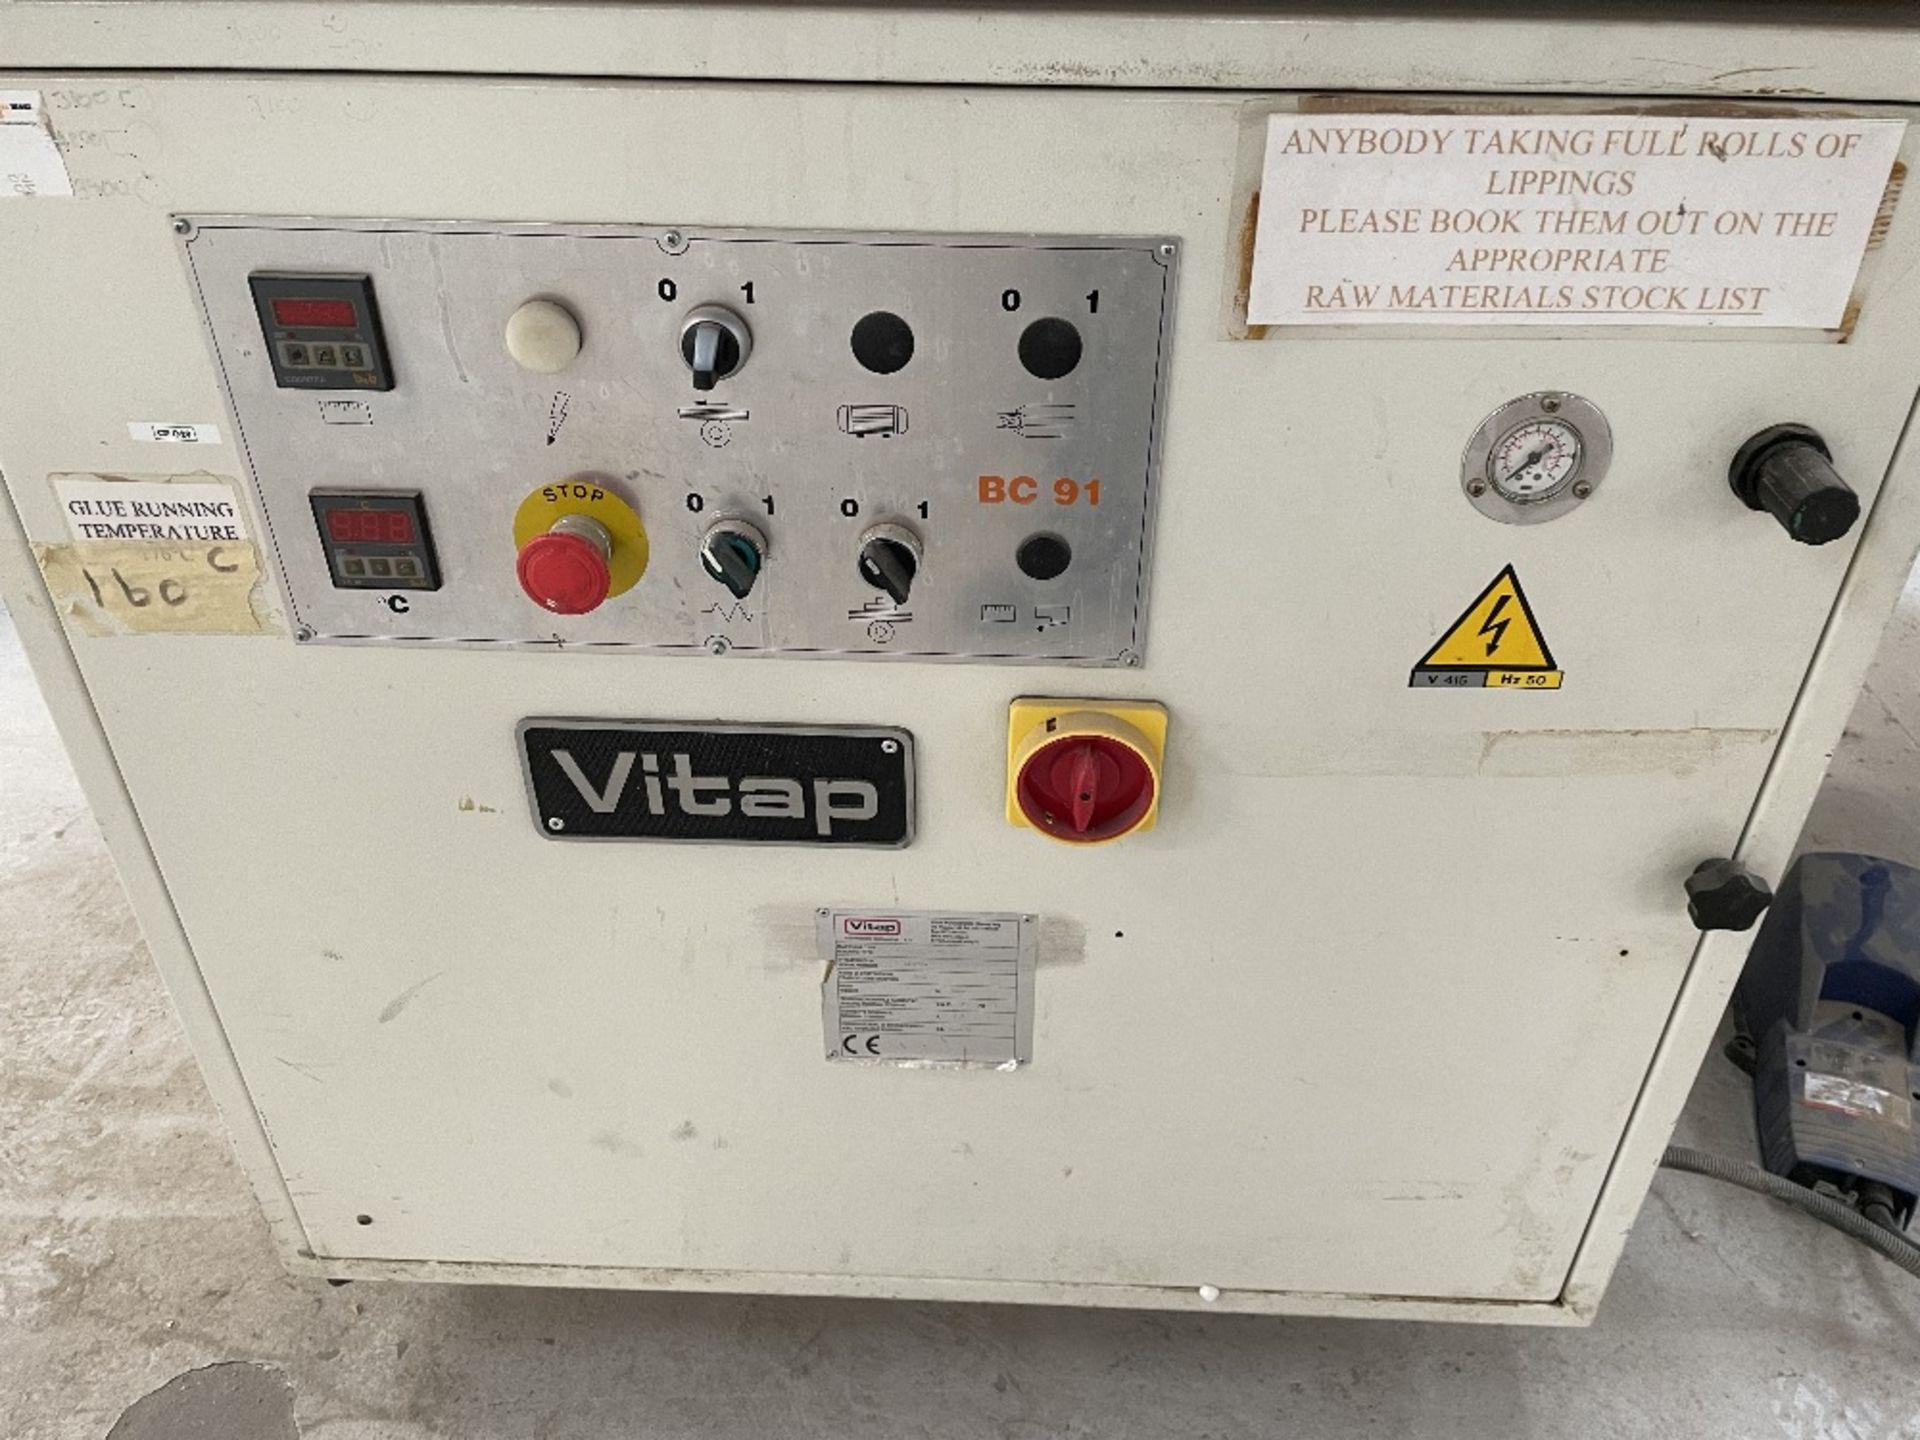 Vitap Bordatrice BC91A Single Sided Edgebander   YOM: 2000 - Image 3 of 5